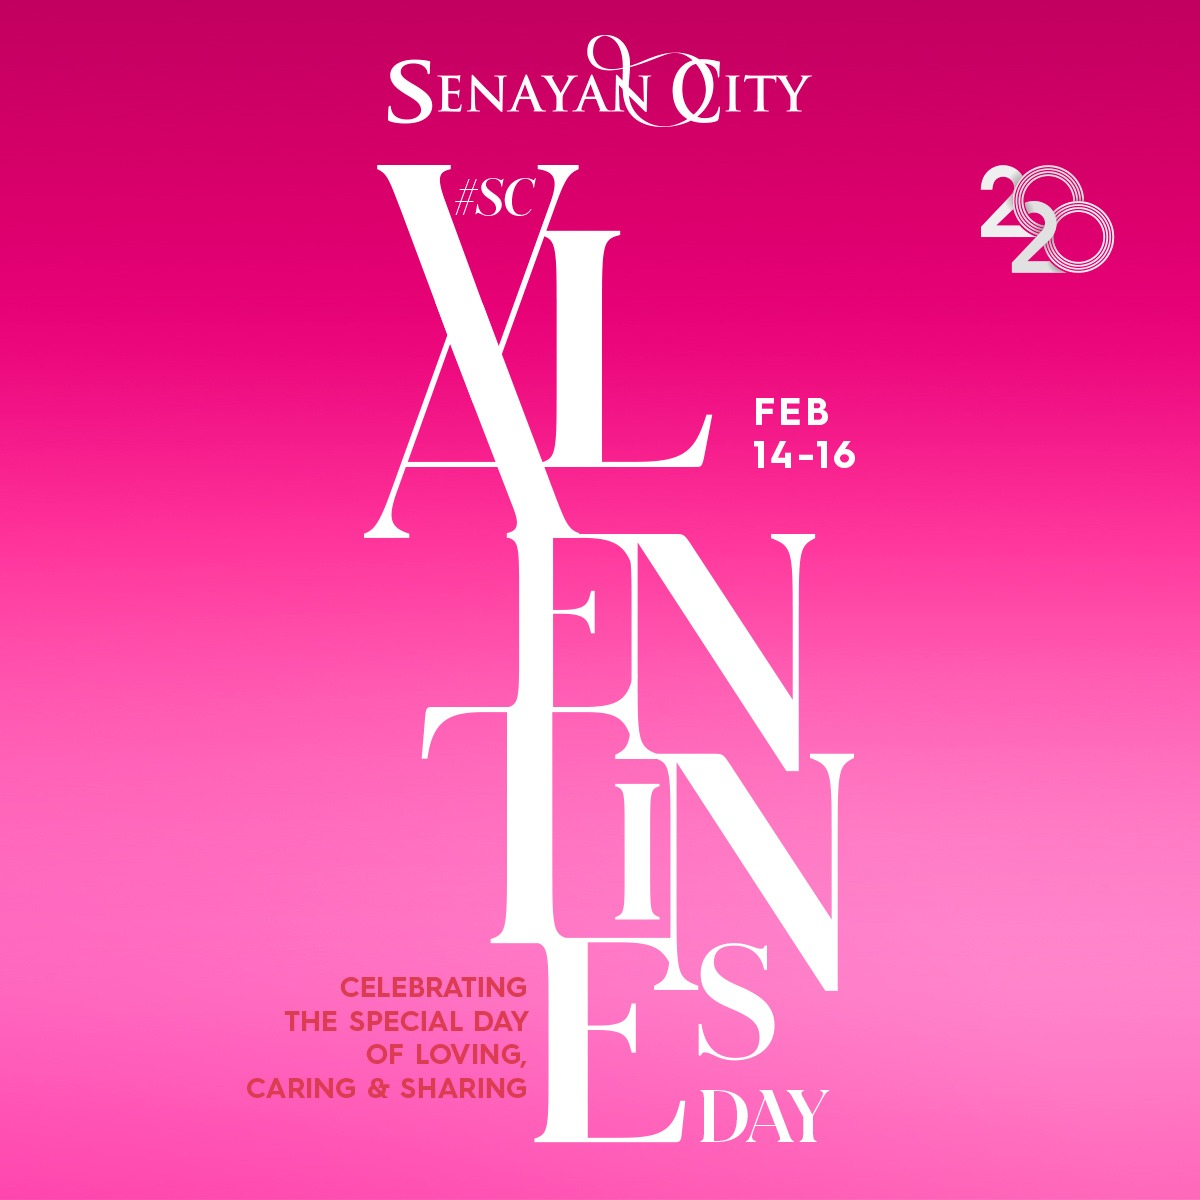 SENAYAN CITY VALENTINE